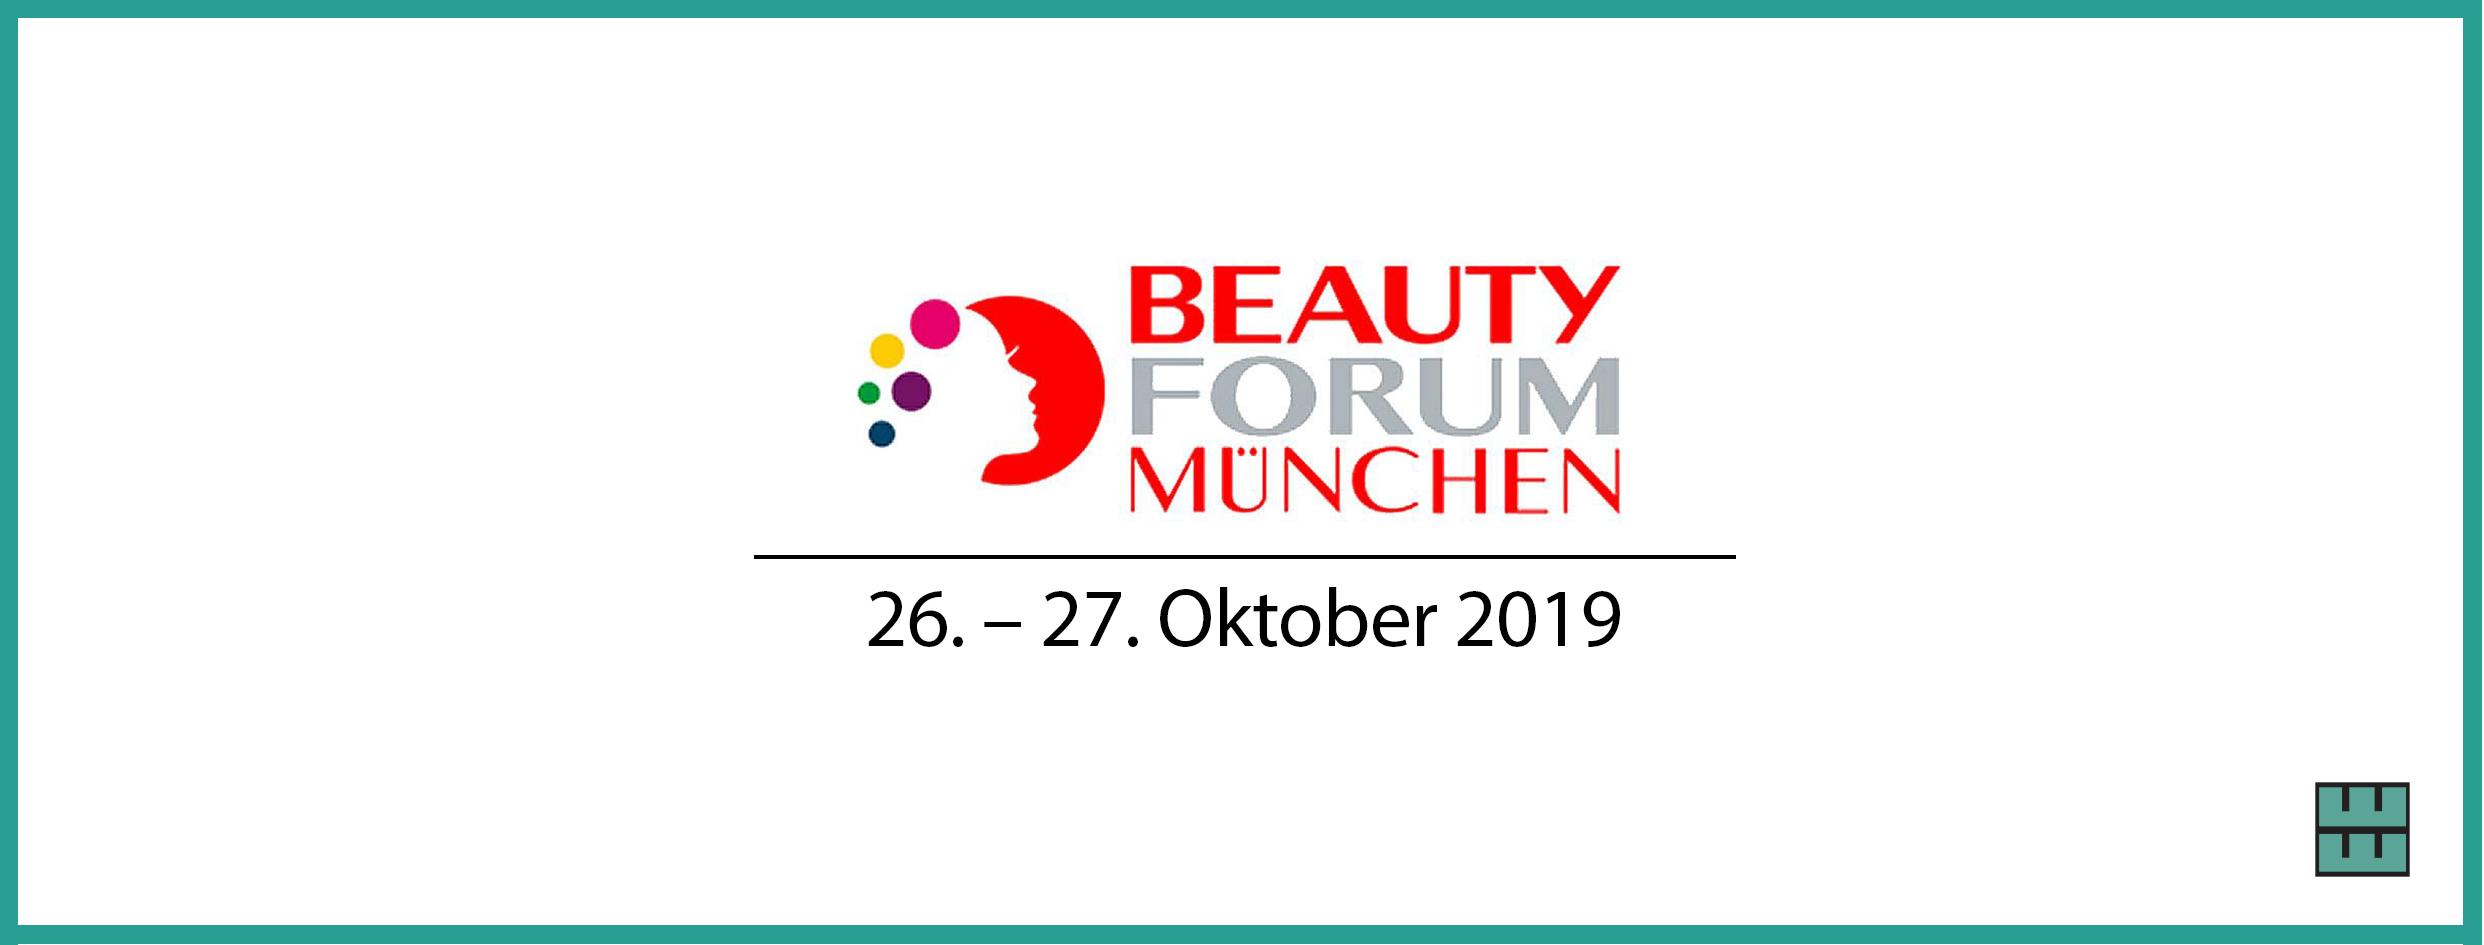 Beauty Forum München 2019 Messebau Hannover Alfeld Weber Werbung